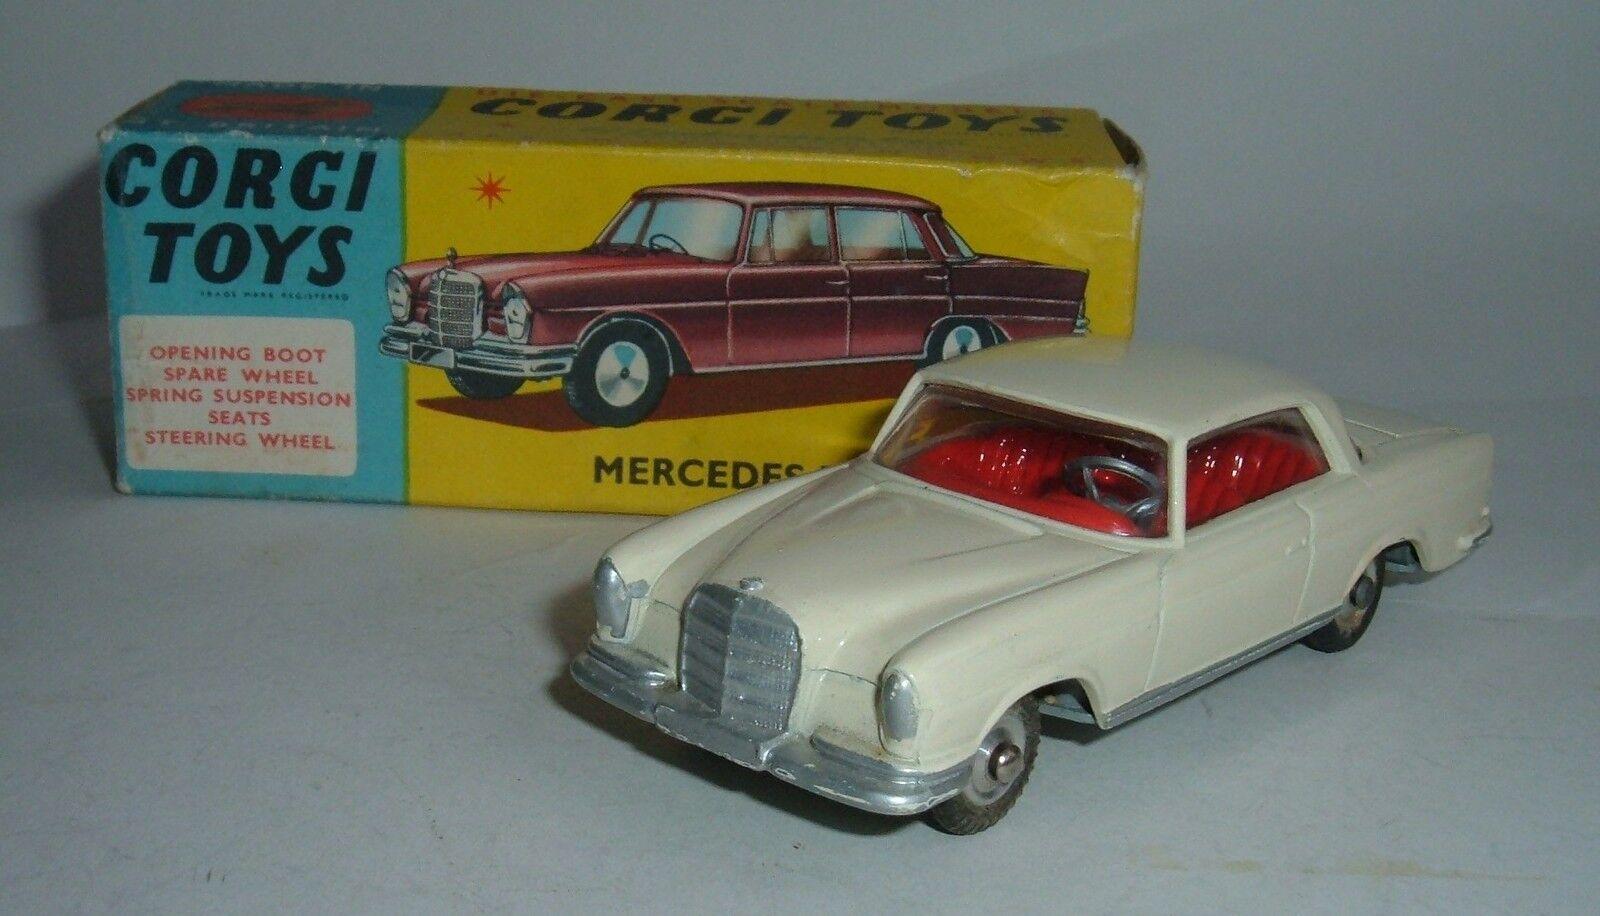 Corgi Toys No. 230, Mercedes-Benz 220SE - Superb Near Mint.